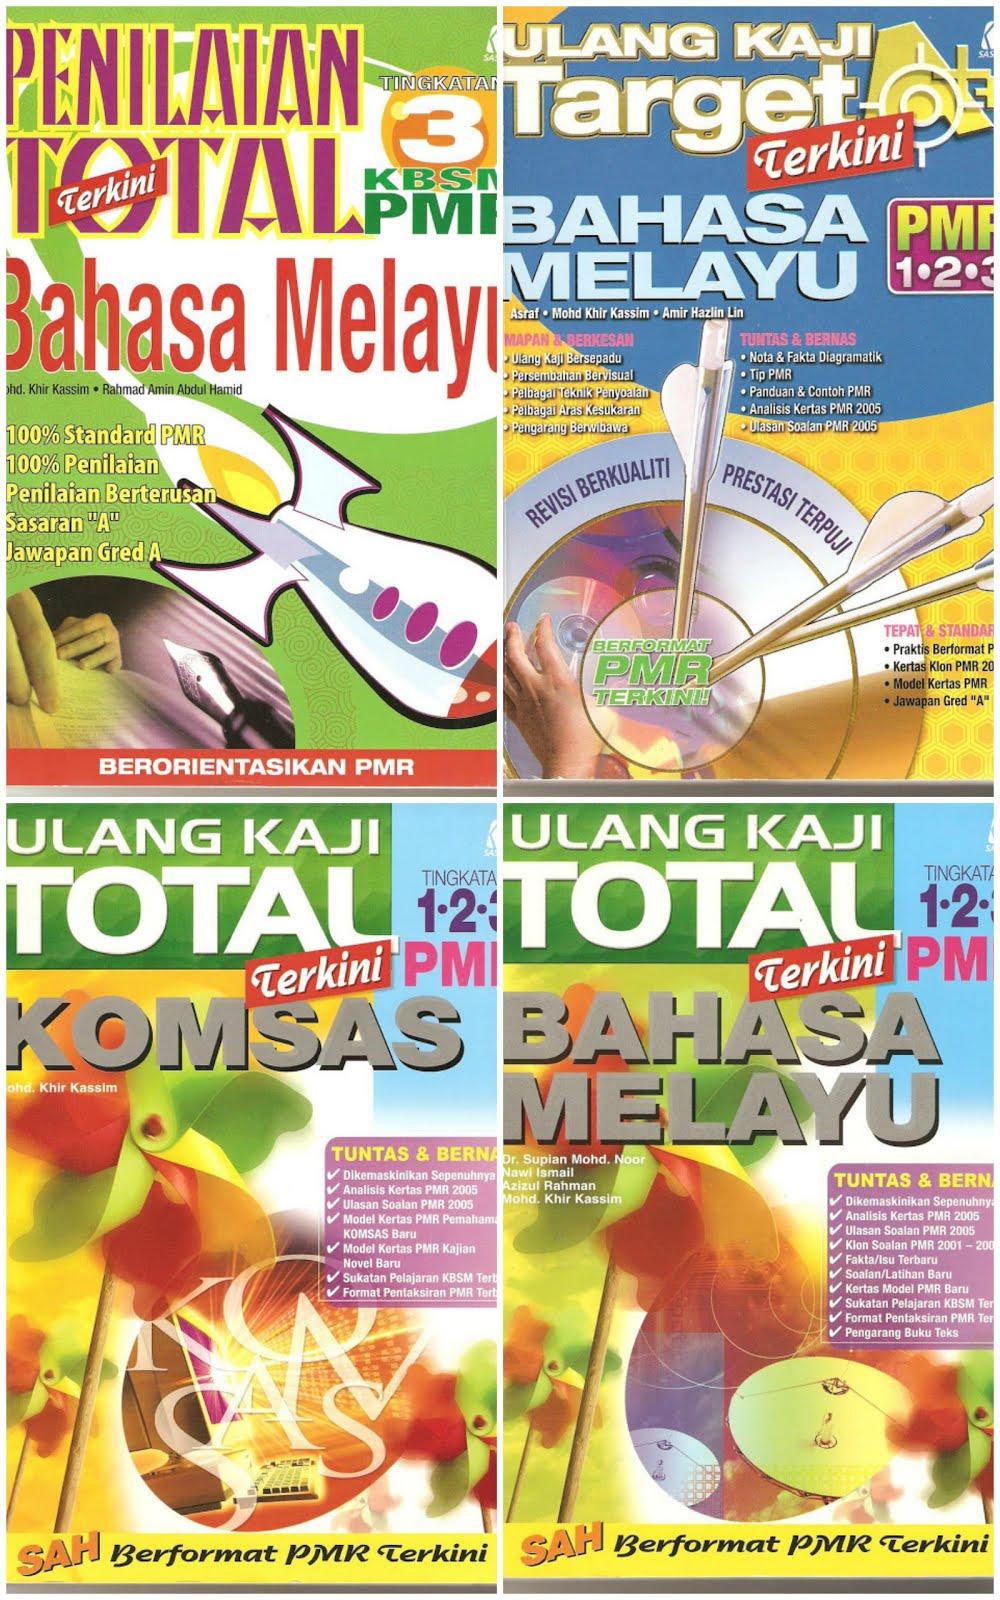 Buku Penilaian Total BM PMR 2006/Buku Target PMR 2006/Buku Total BM PMR 2006/Buku Total Komsas PMR